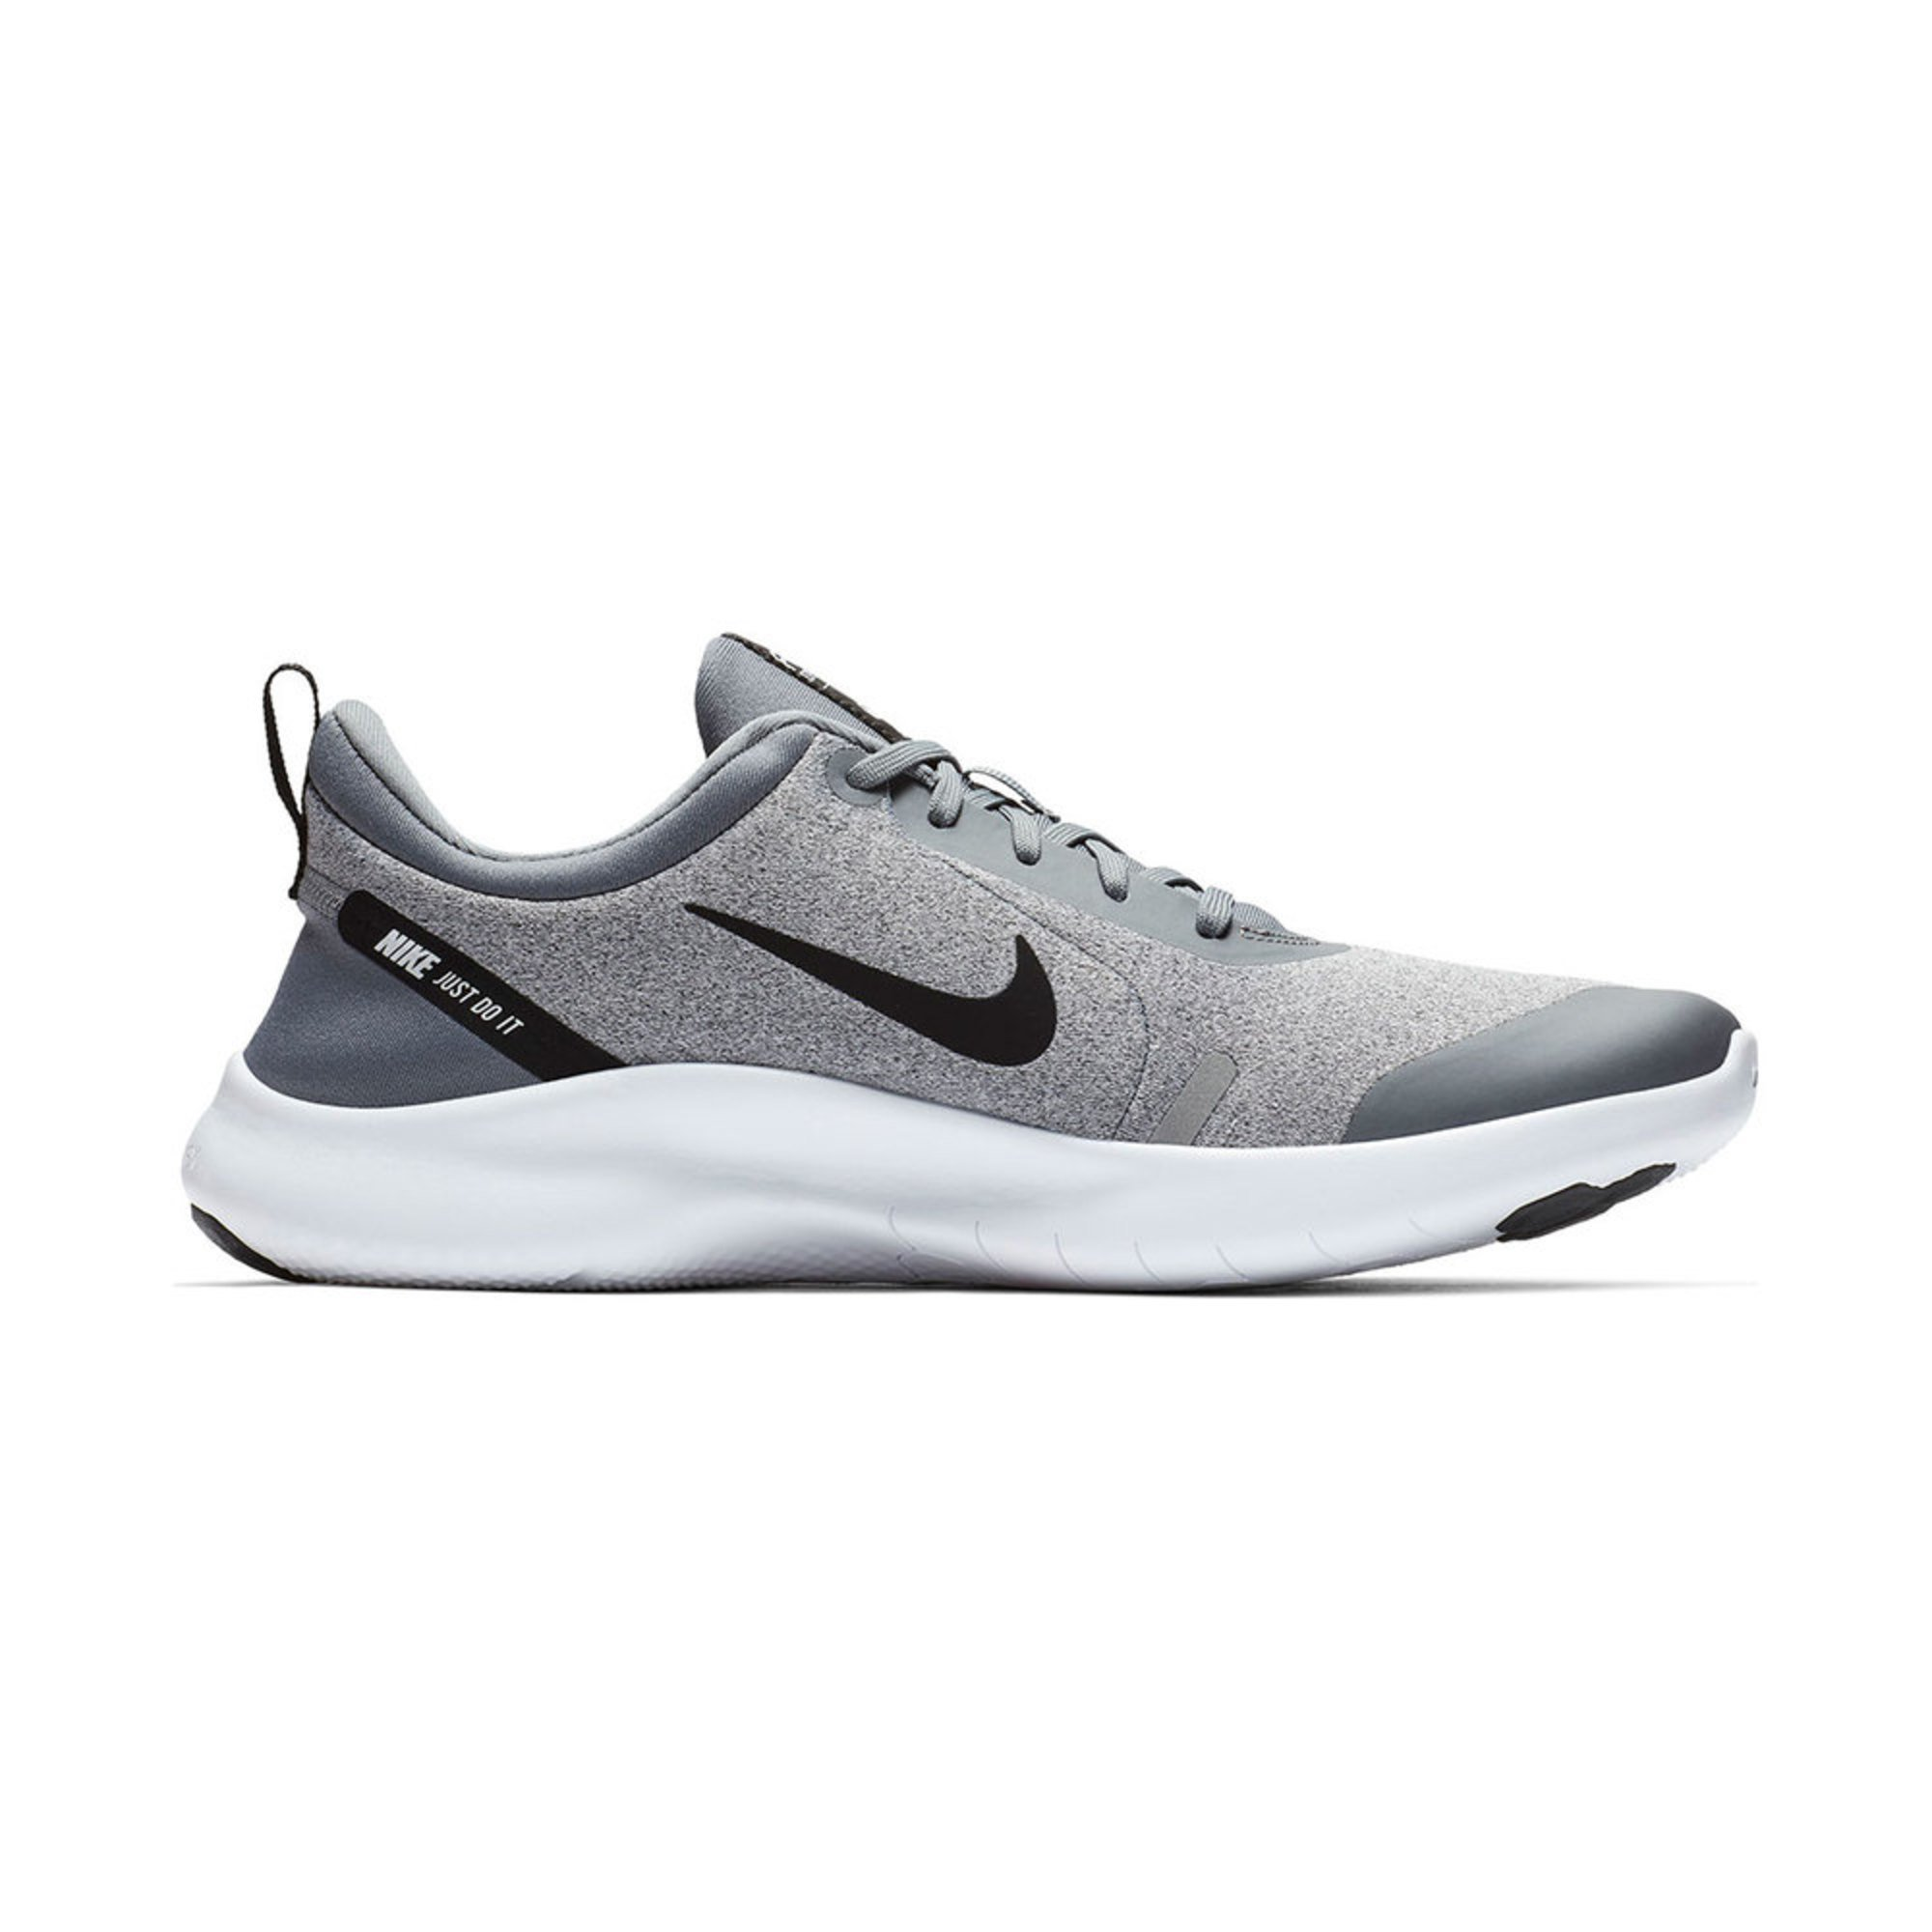 d7aab56f84aeb Nike. Nike Men s Flex Experience RN 8 Running Shoe